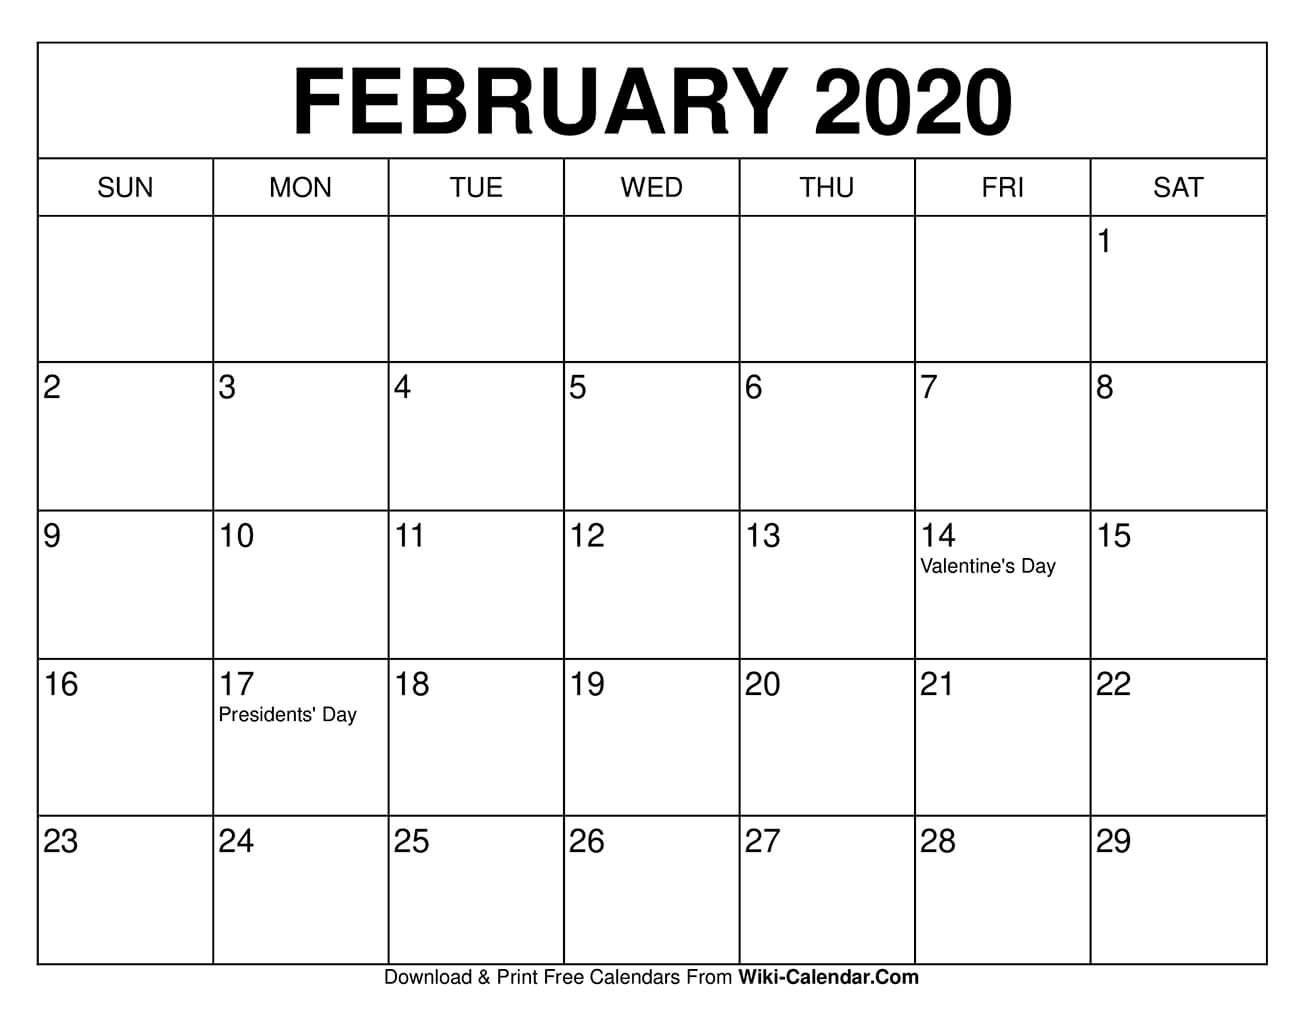 Free Printable February 2020 Calendar Templates These Free